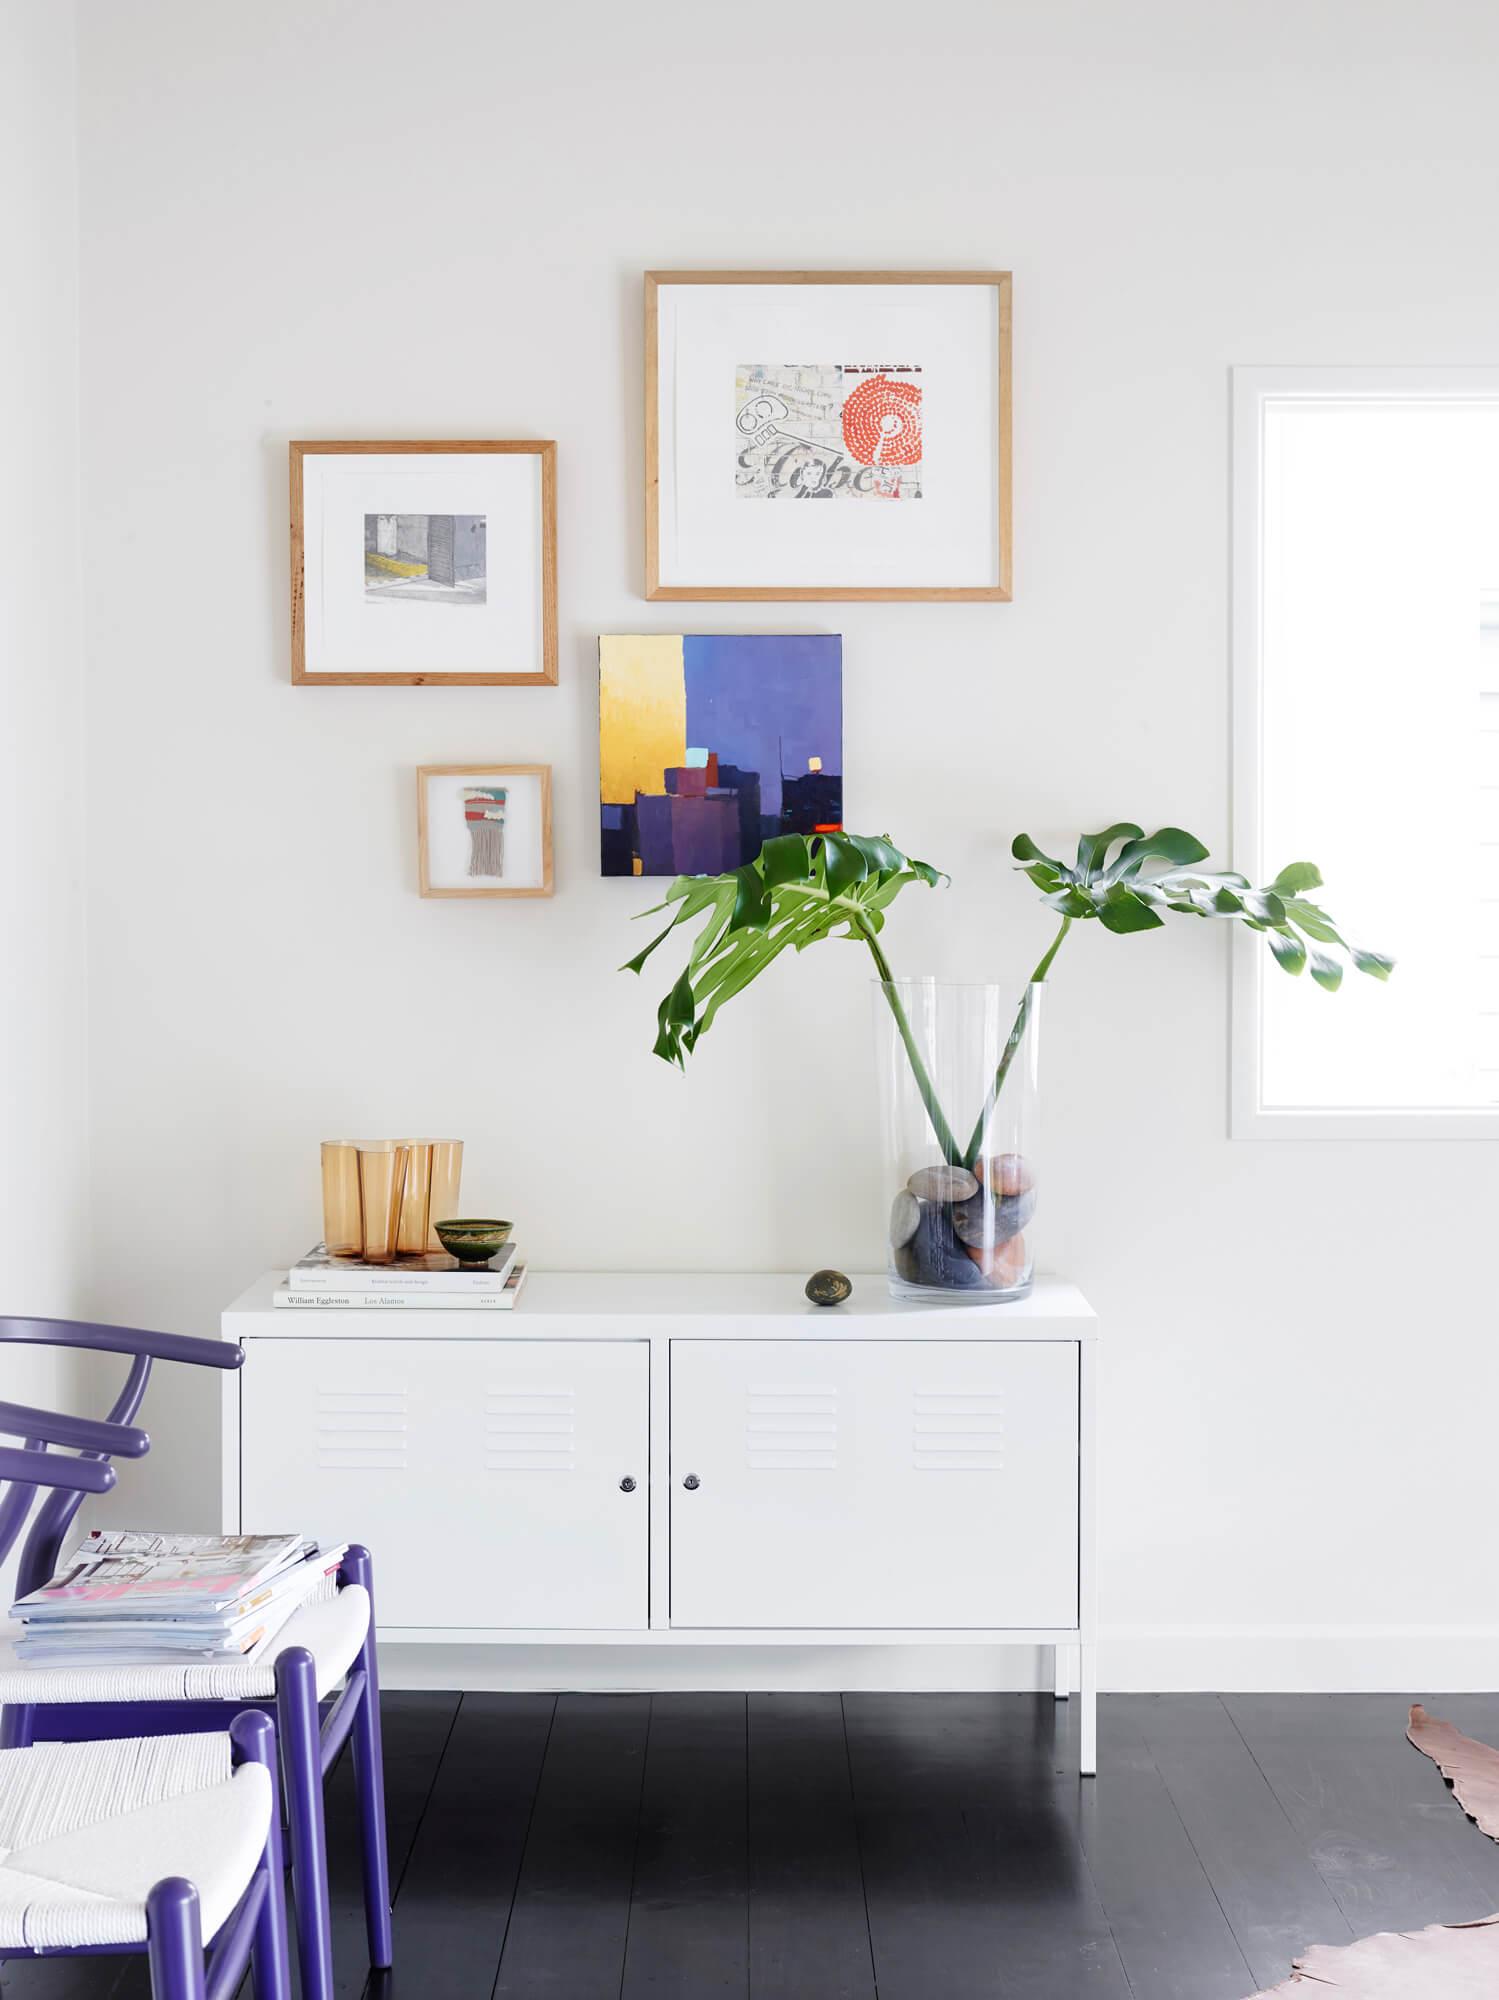 georgia-cannon-interior-designer-brisbane-project-m2-house-017076.jpg